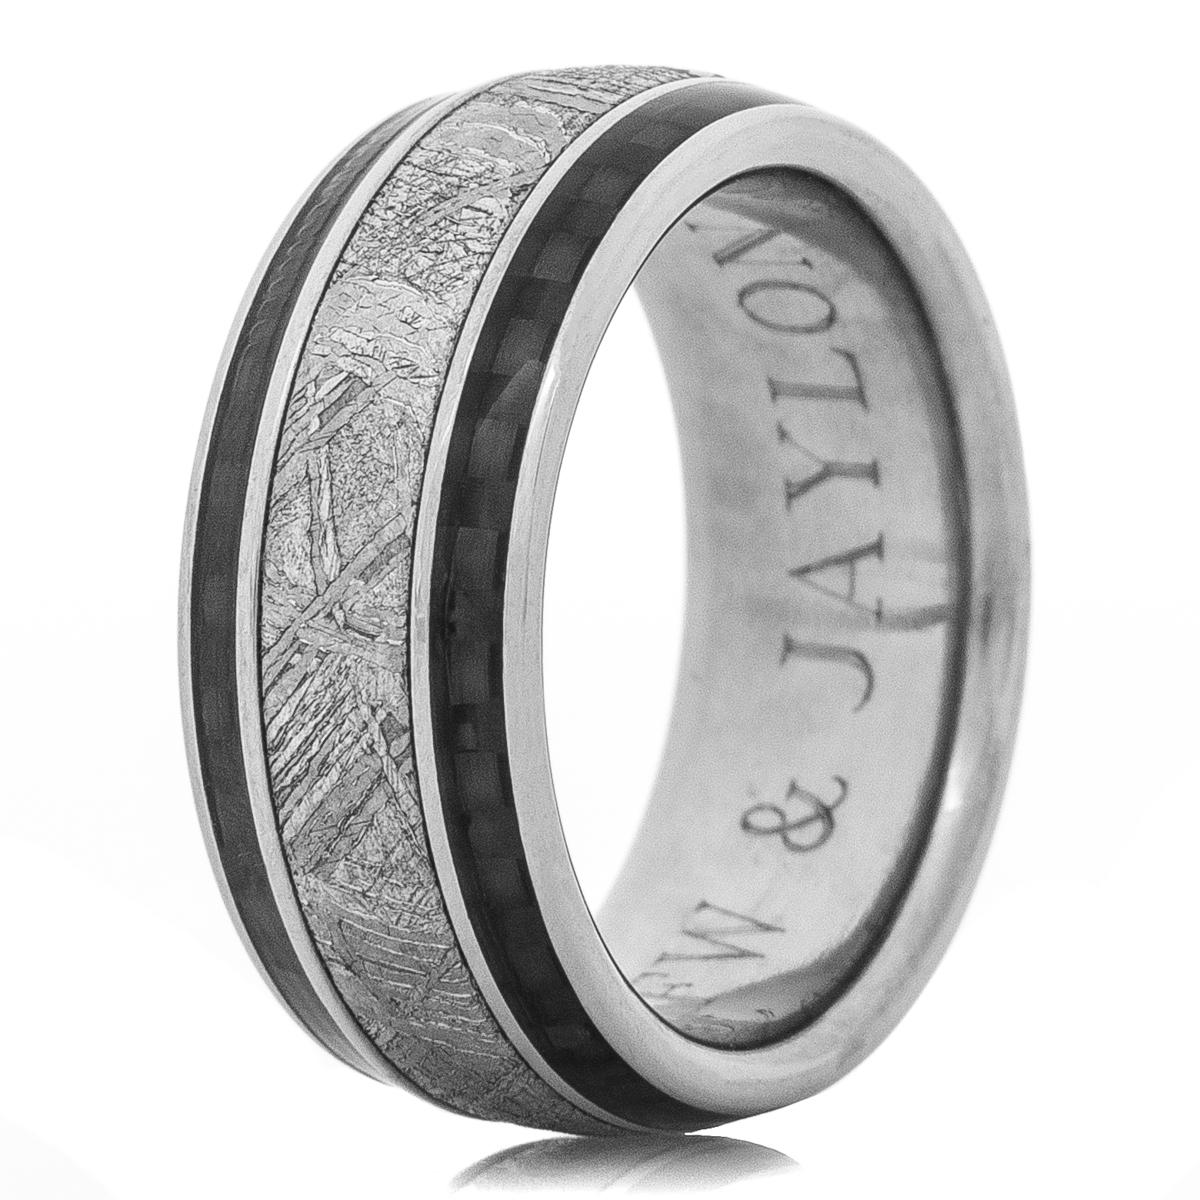 Men's Accented Titanium Meteorite Ring with Twin Carbon Fiber Inlays